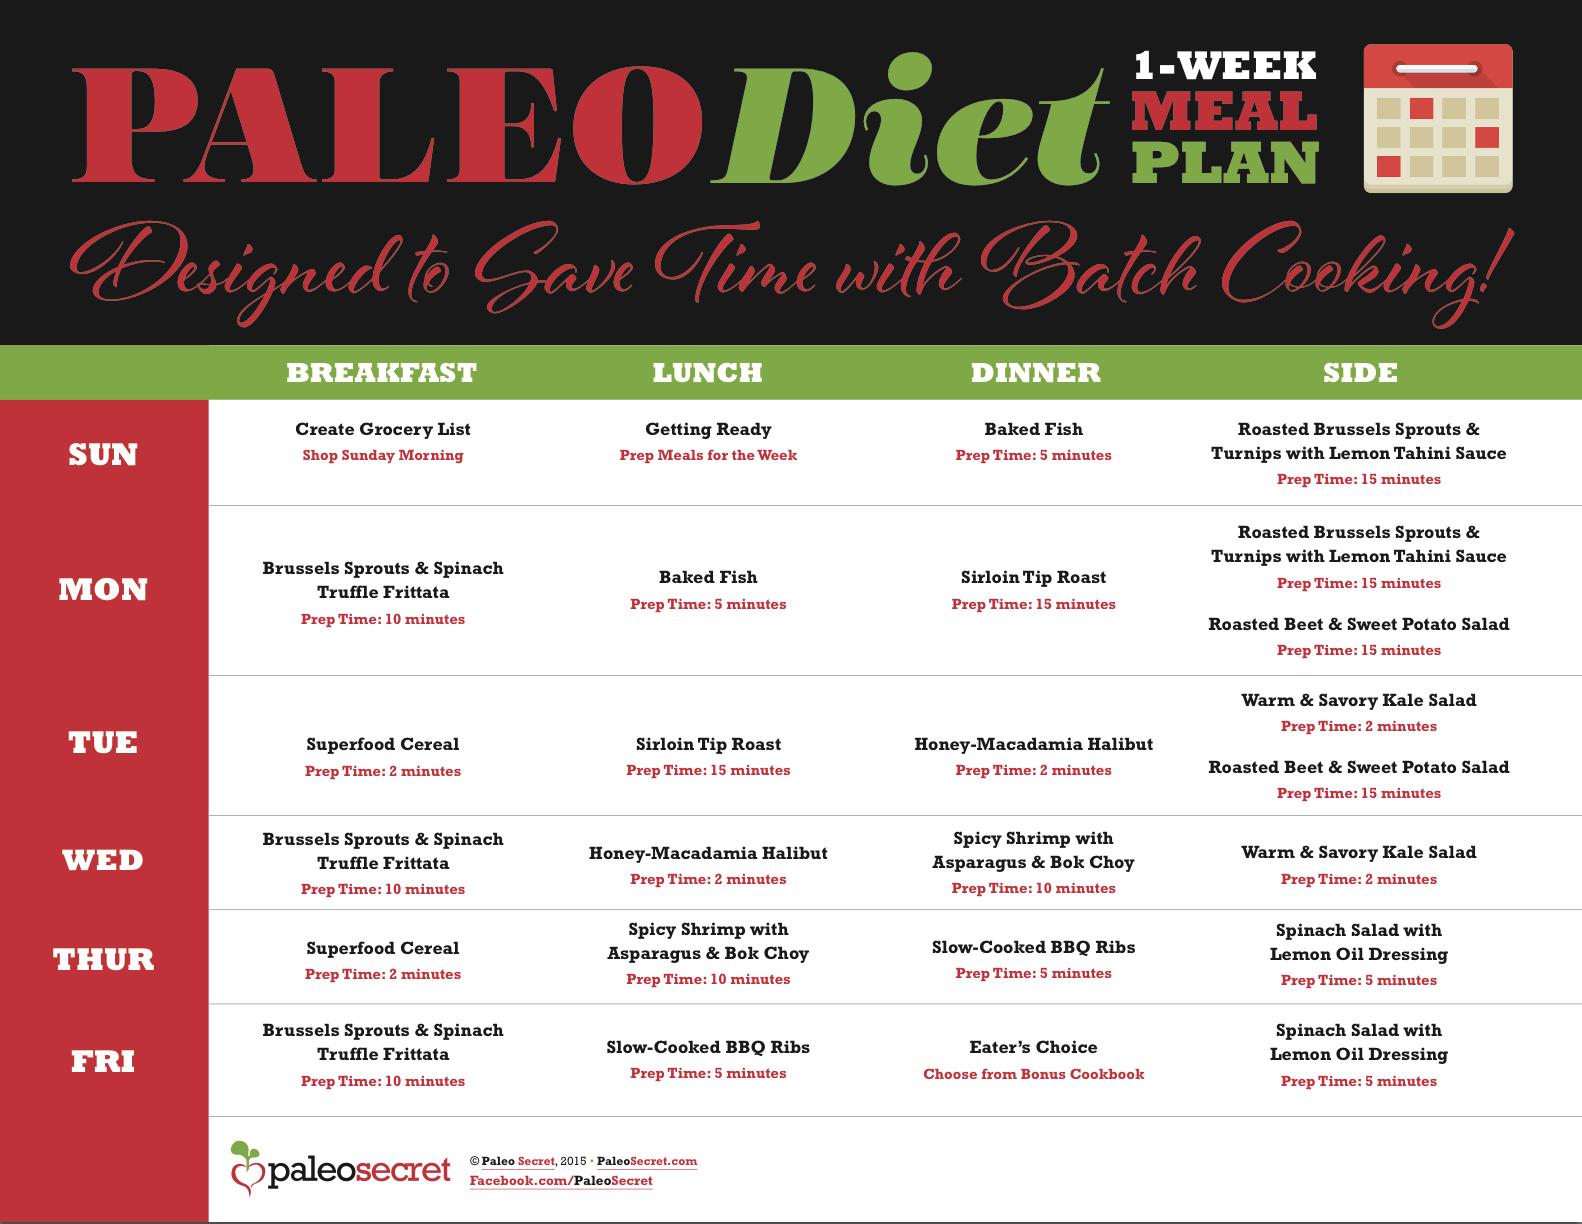 paleo diet meal plan free pdf